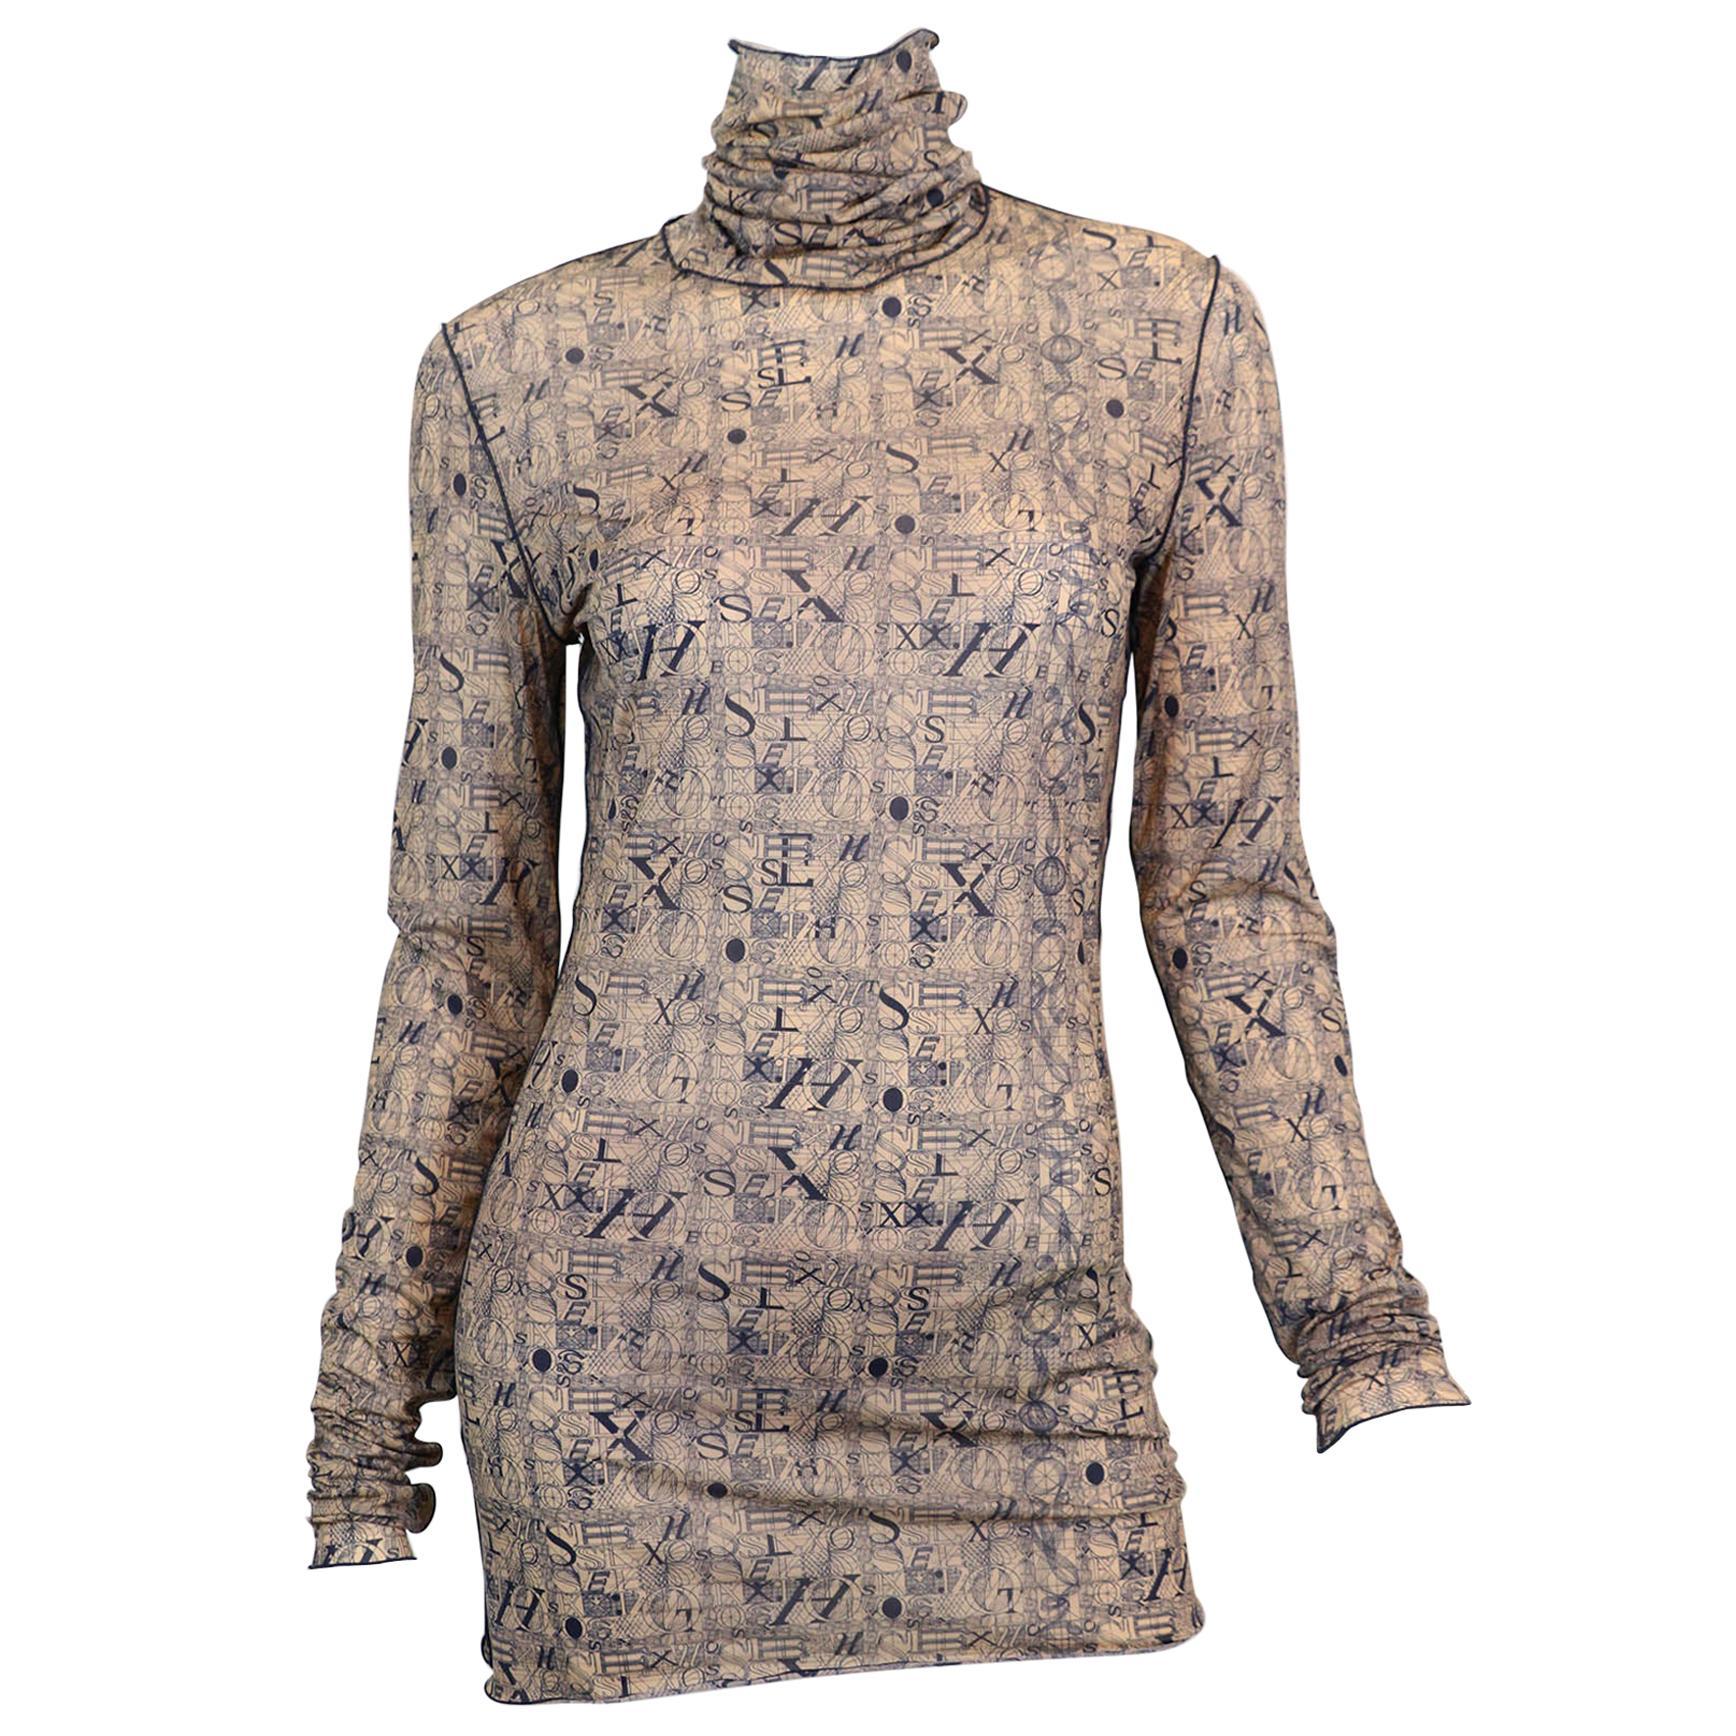 Jean Paul Gaultier Femme Explicit HOT SEX Top Dress